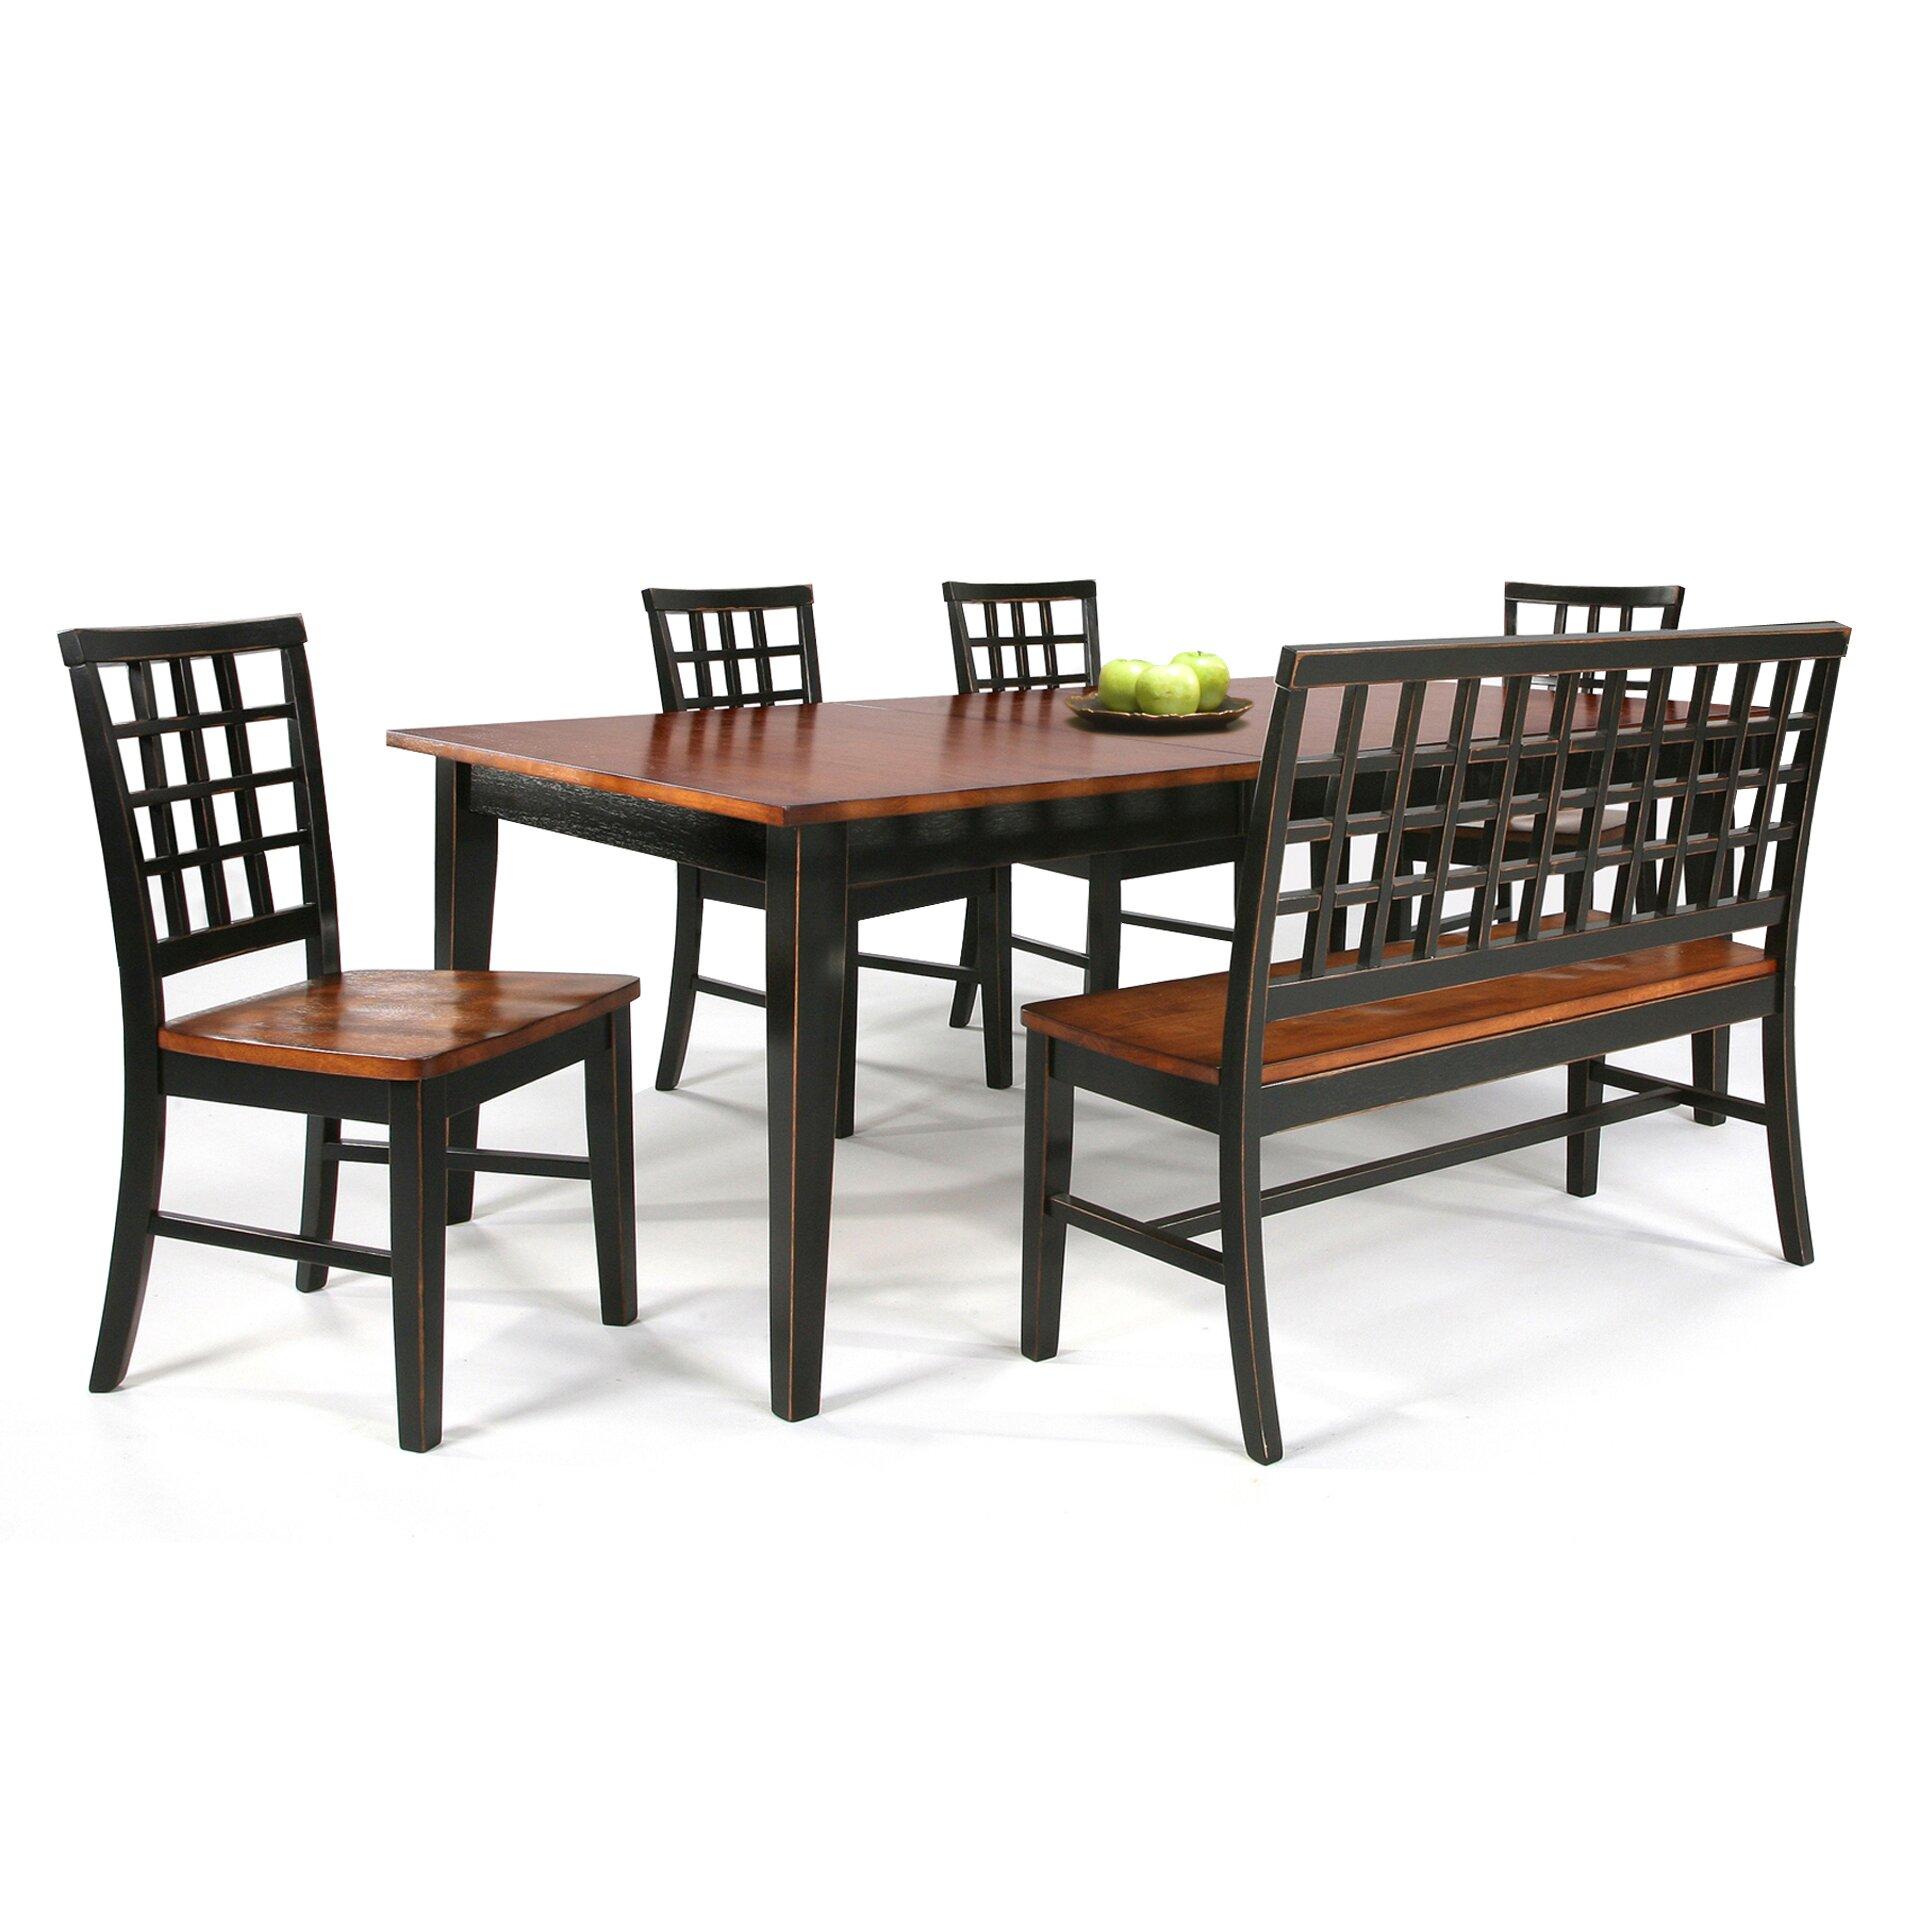 Imagio home arlington two seat bench reviews wayfair - Table benches kitchen ...